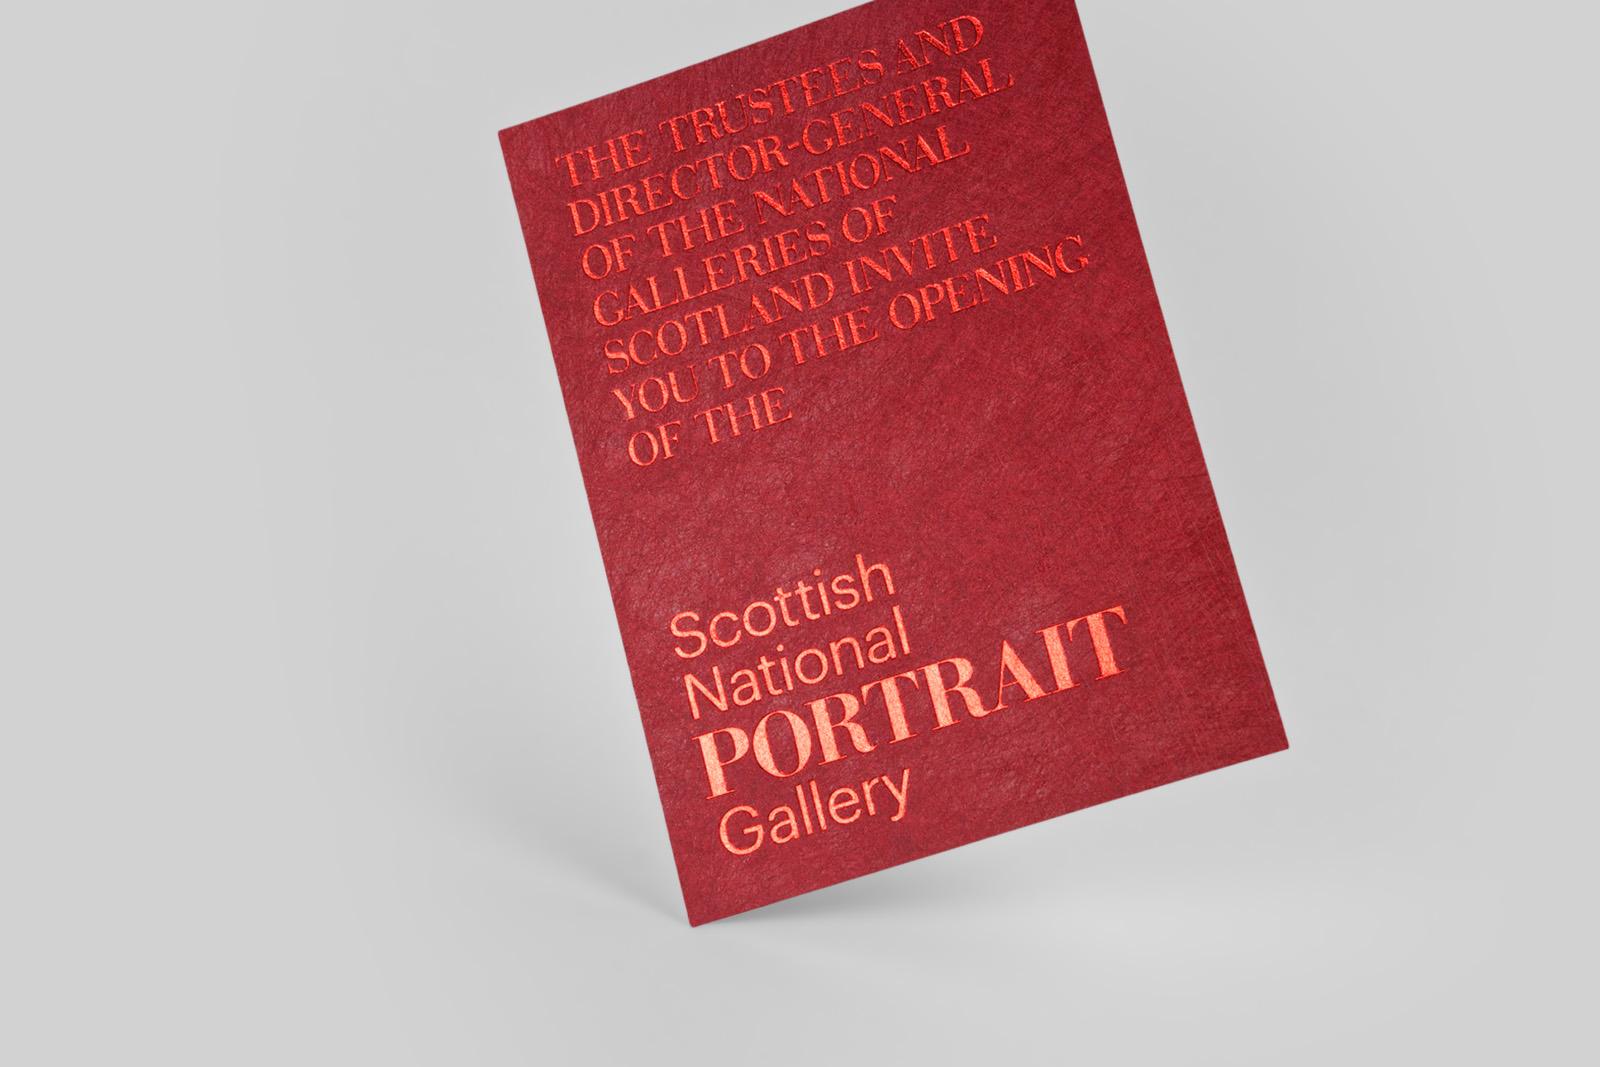 ostreet-portrait-gallery-4